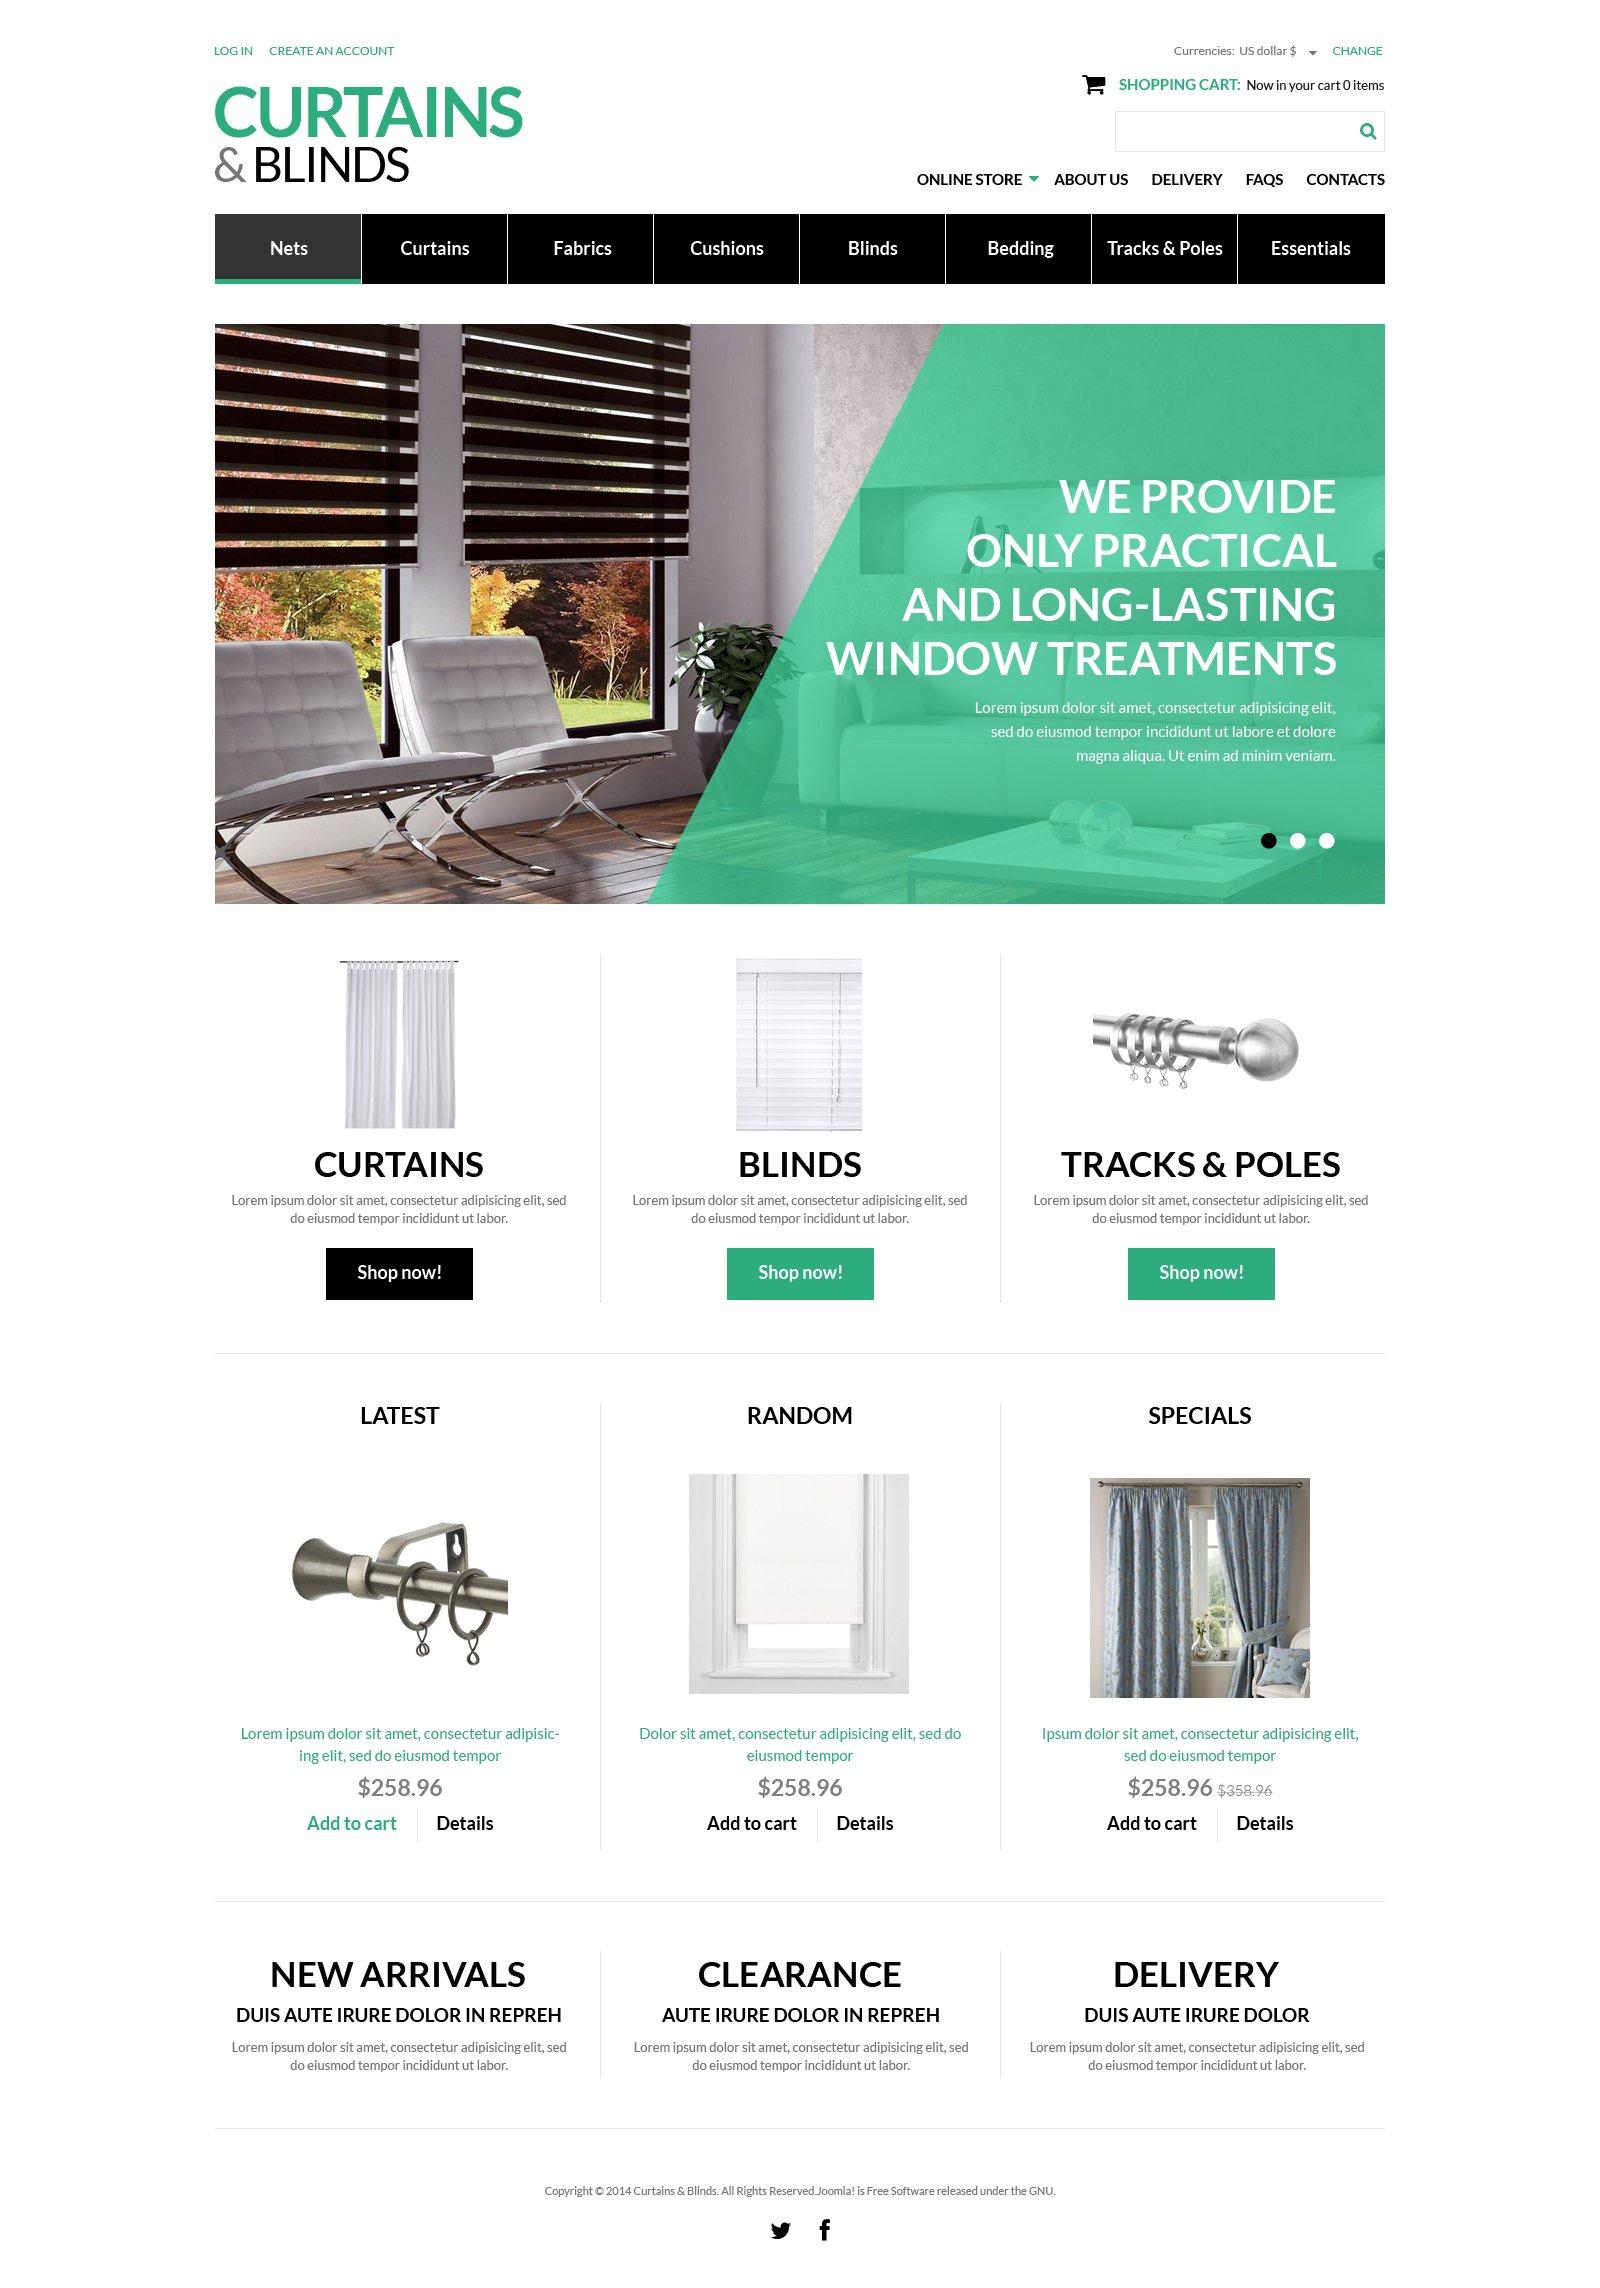 Szablon VirtueMart Curtains  Blinds Salon #50916 - zrzut ekranu